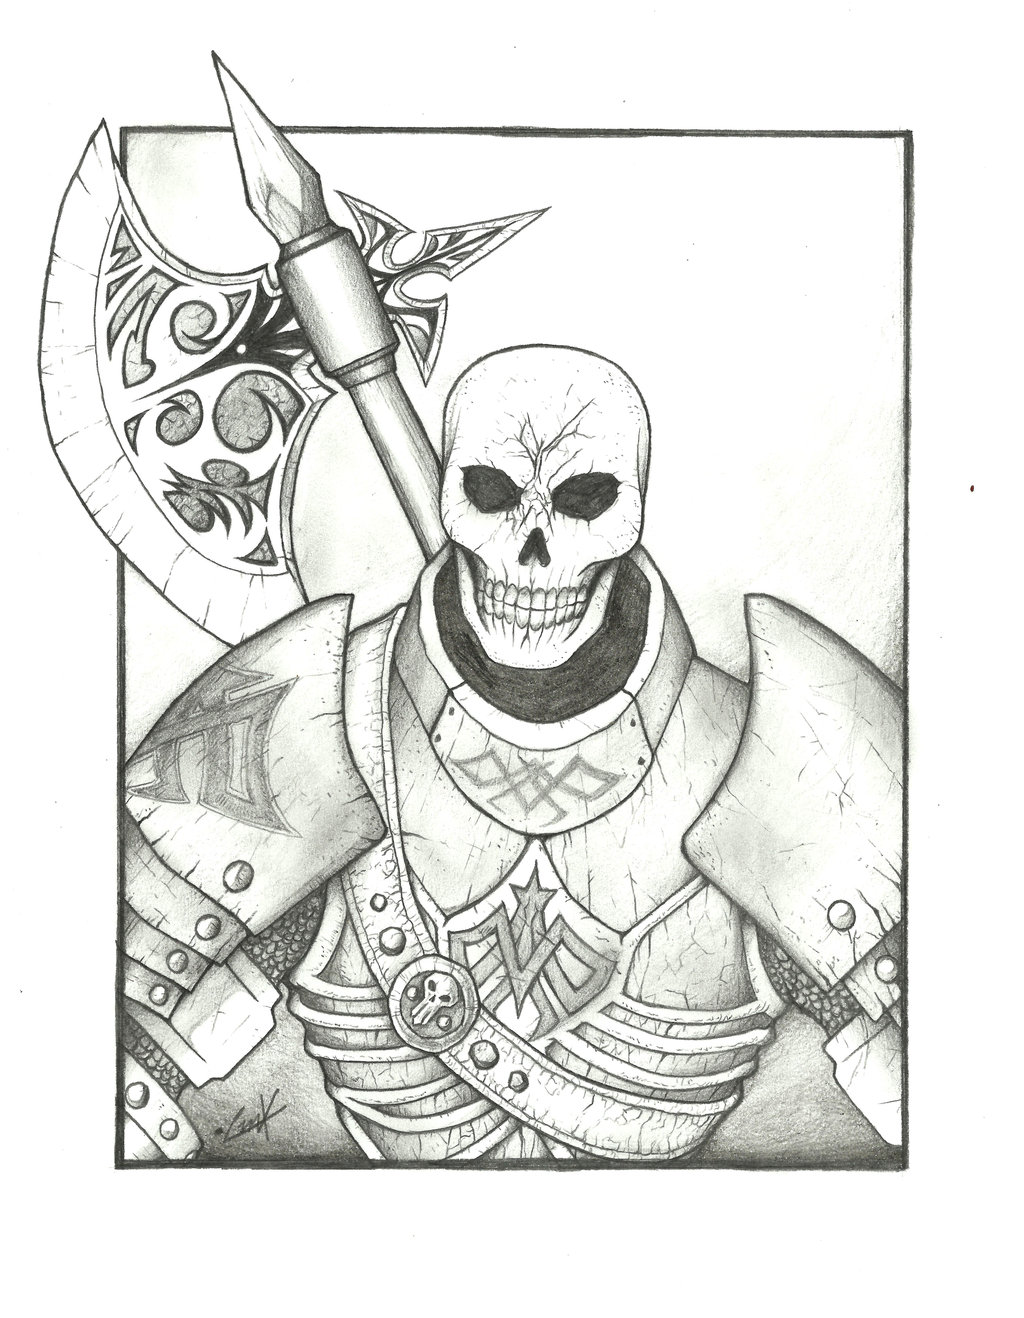 Drawn sleleton skeleton knight KrumpZero Knight Skeleton Knight by